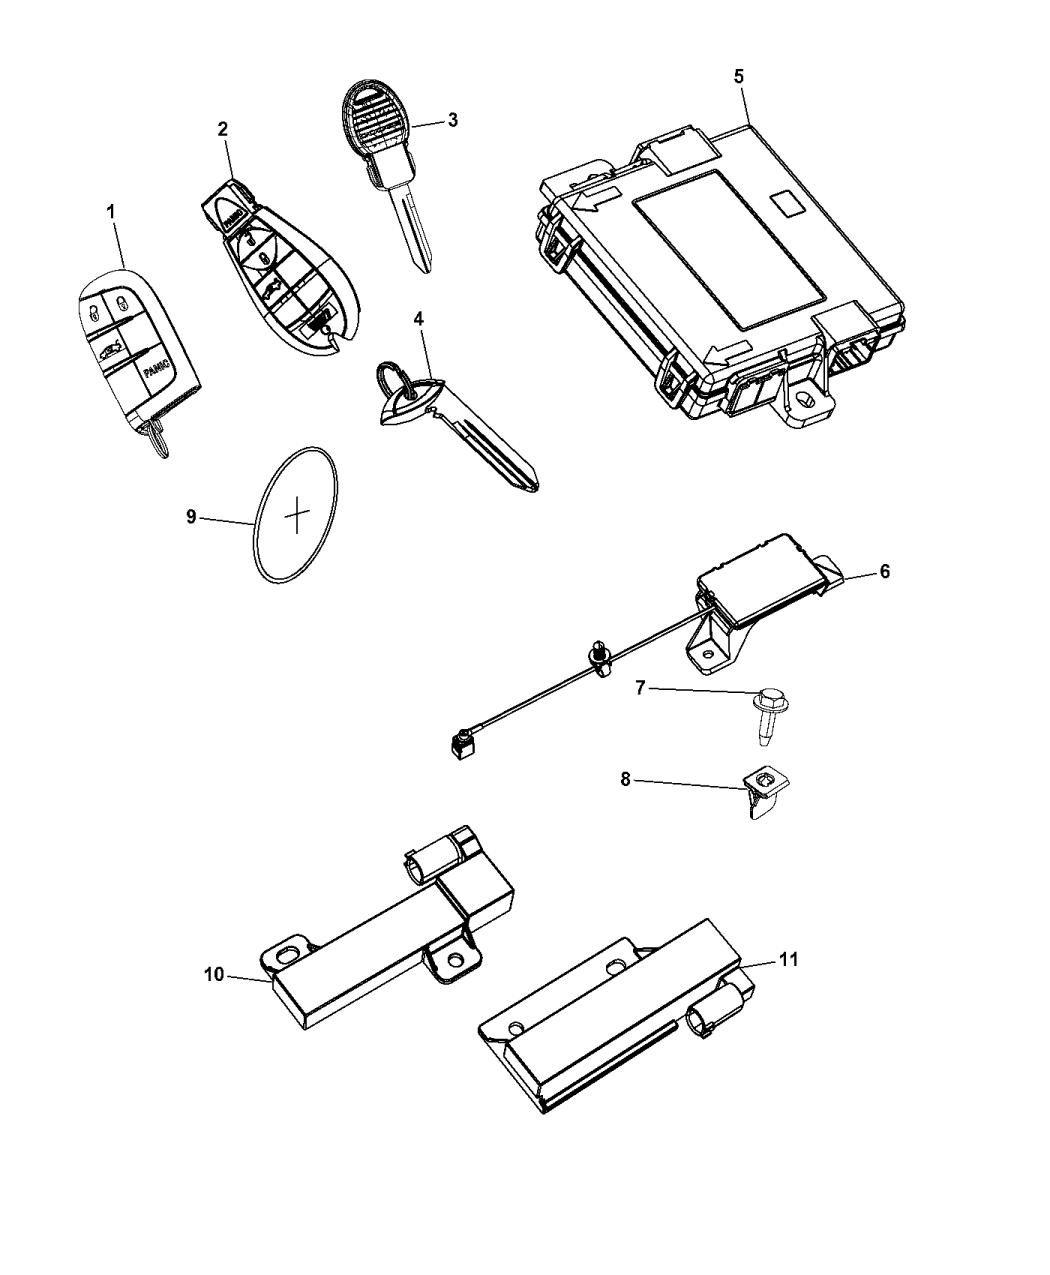 2014 Dodge Dart Modules Keyless Receiver Transmitter And Antenna Wiring Diagram